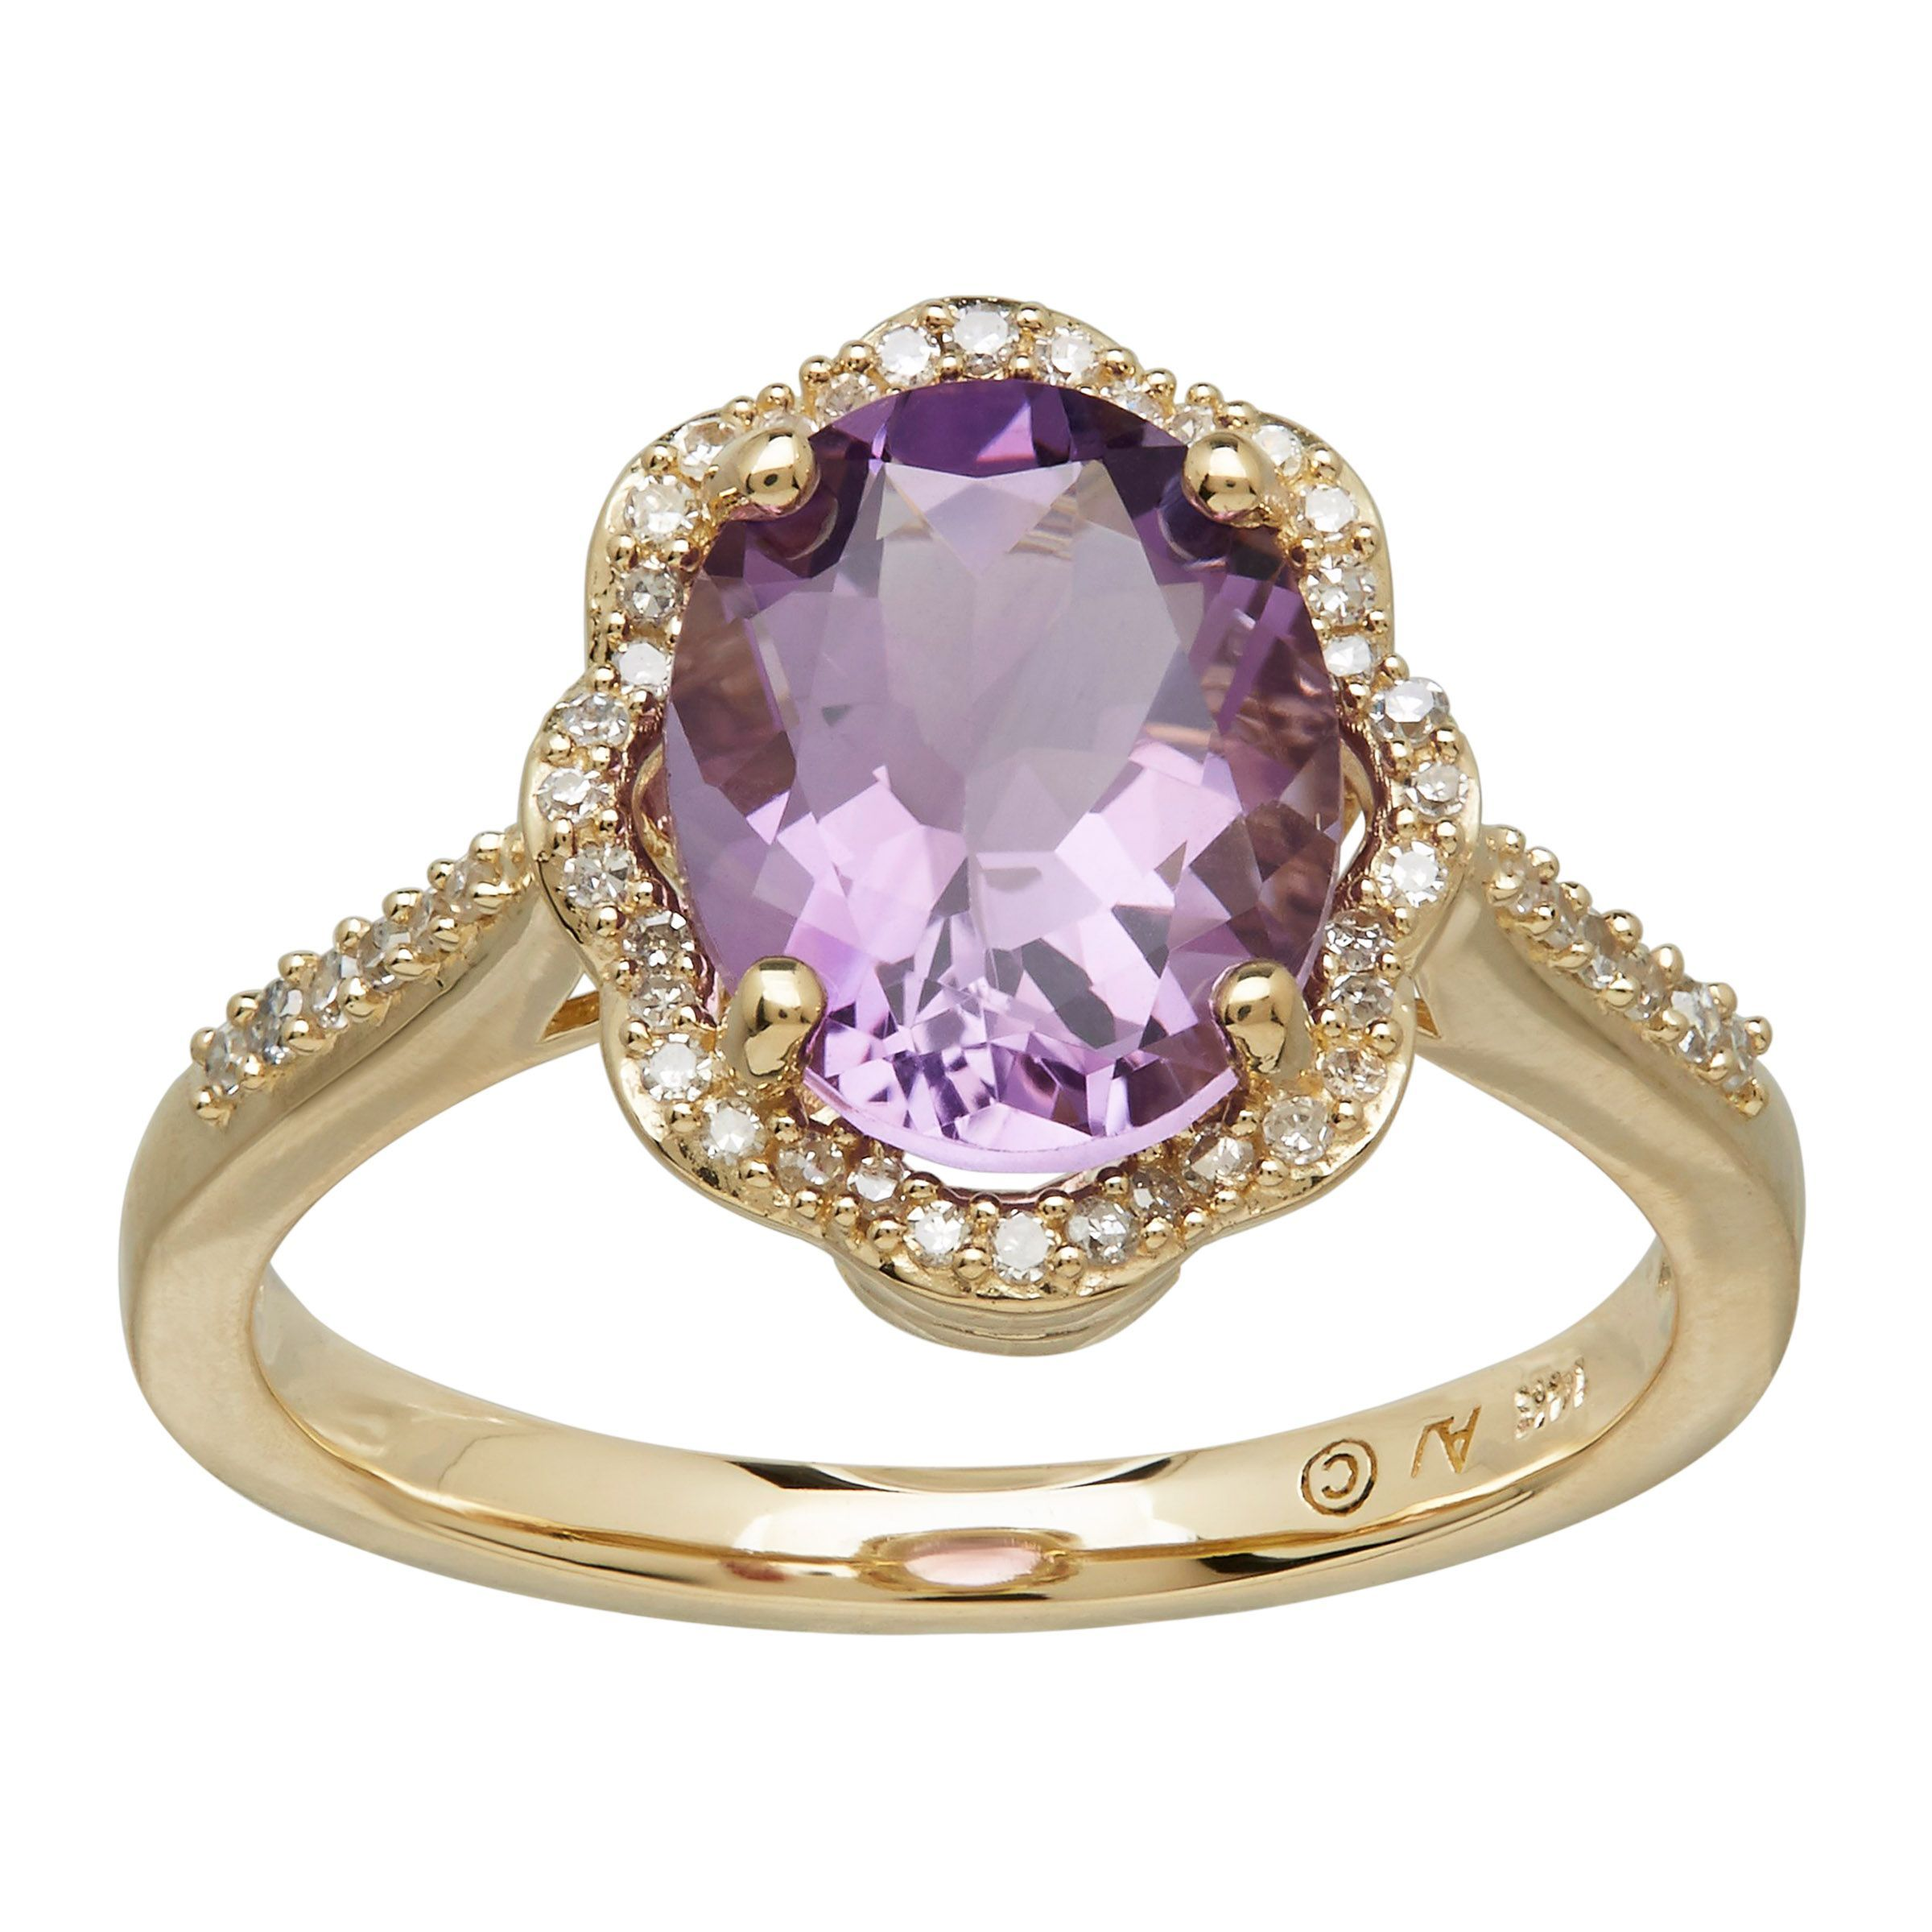 14k yellow gold amethyst and diamond scalloped ring